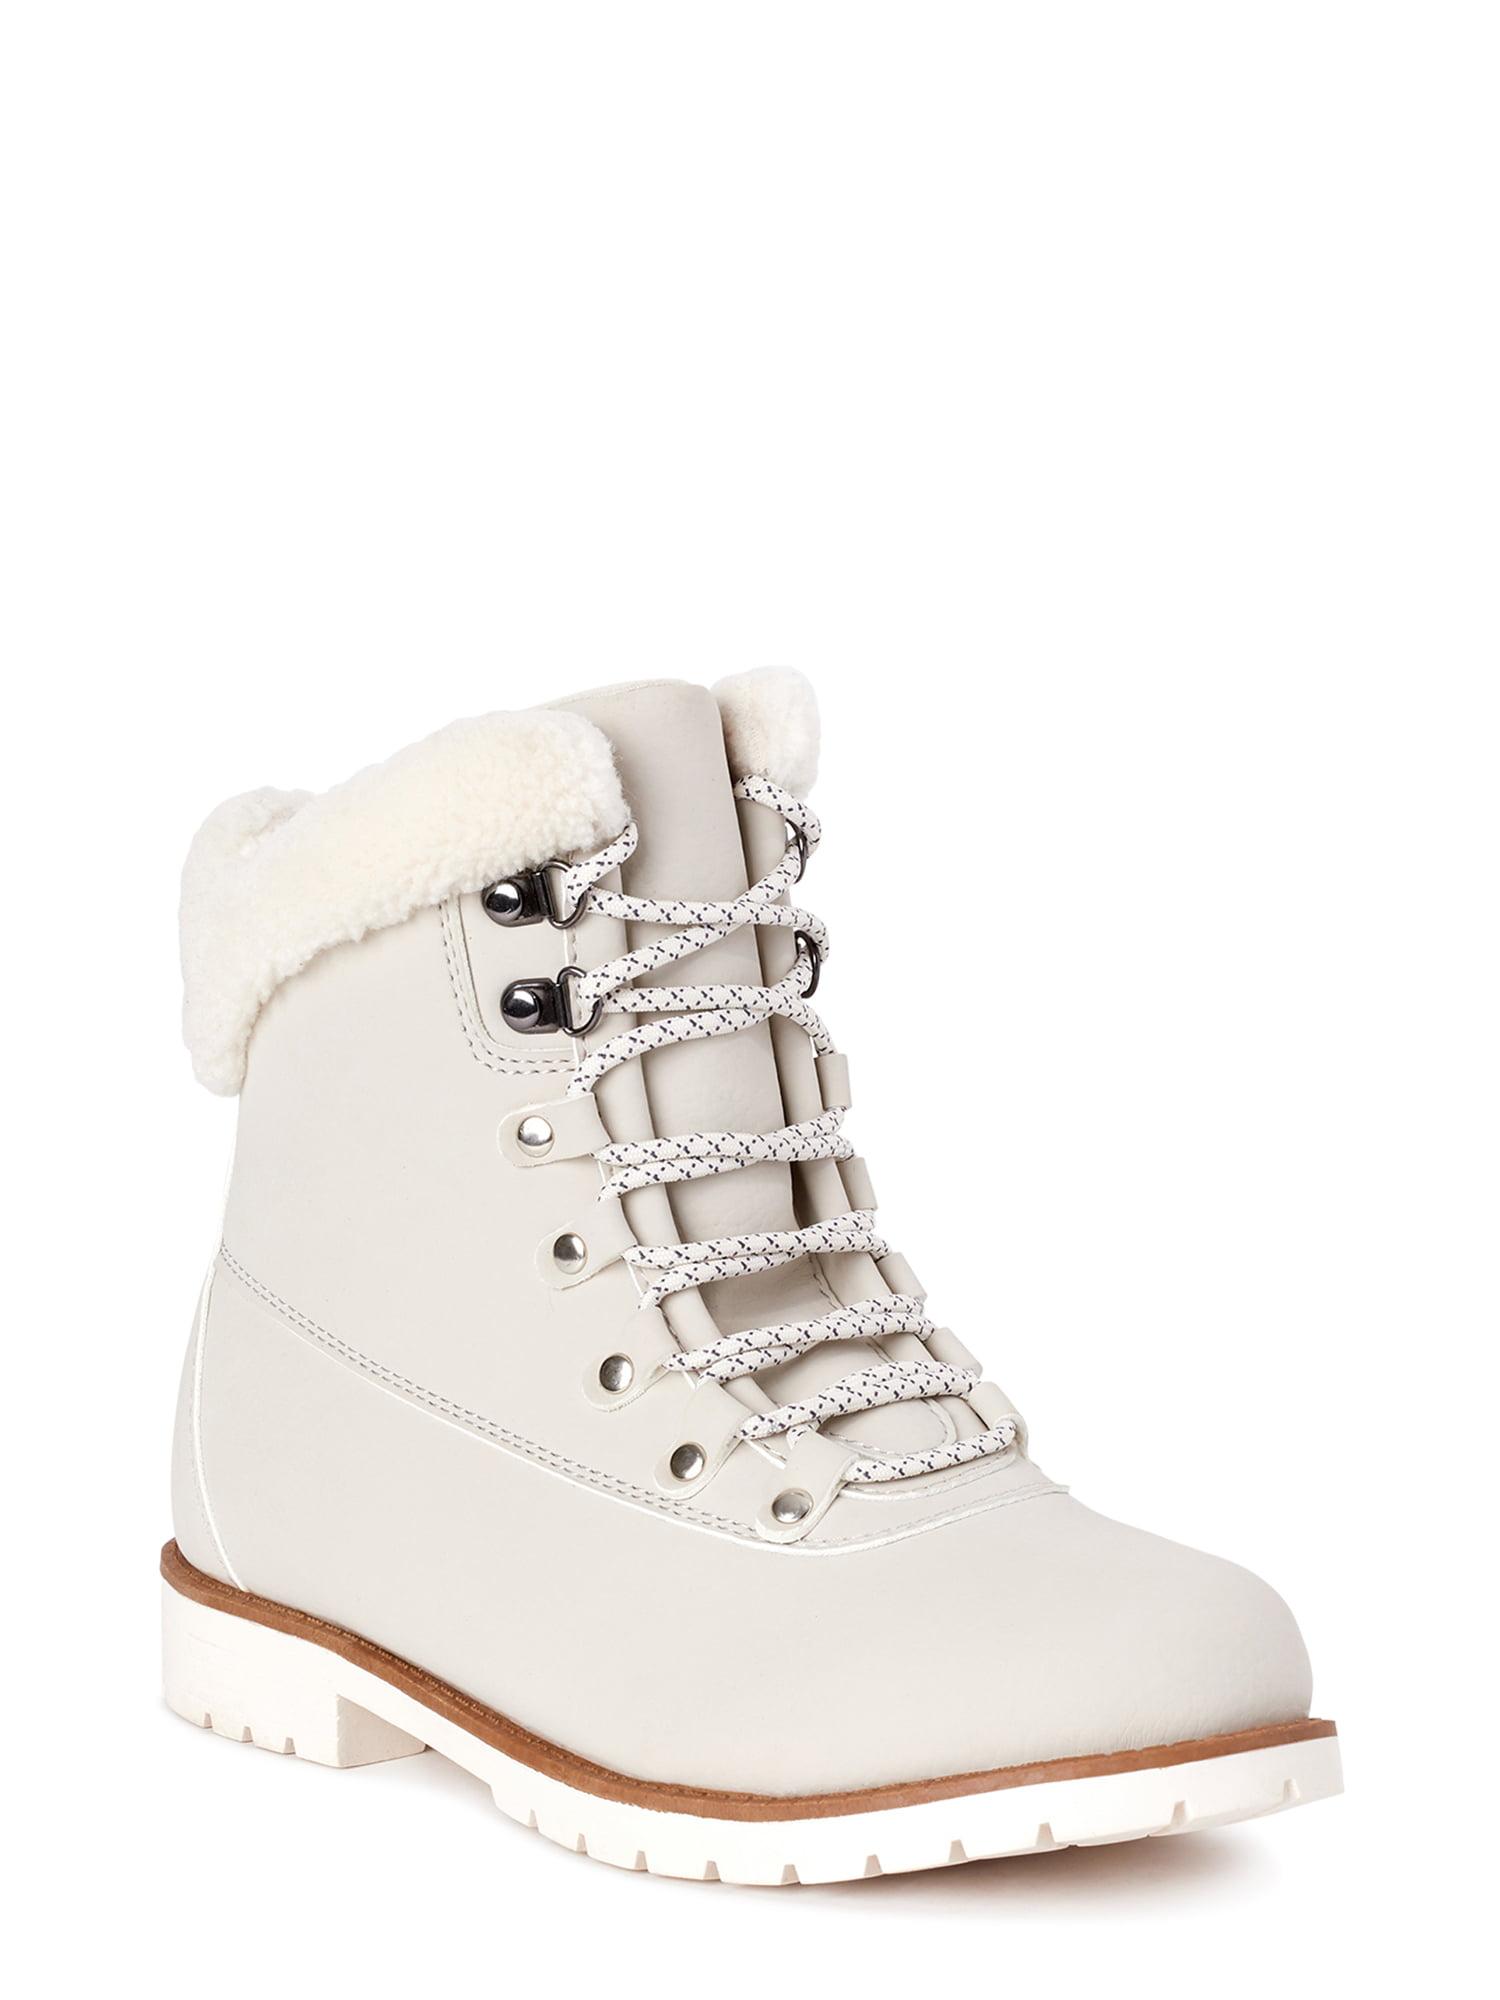 and Tru Women's Lug Bottom Winter Boots